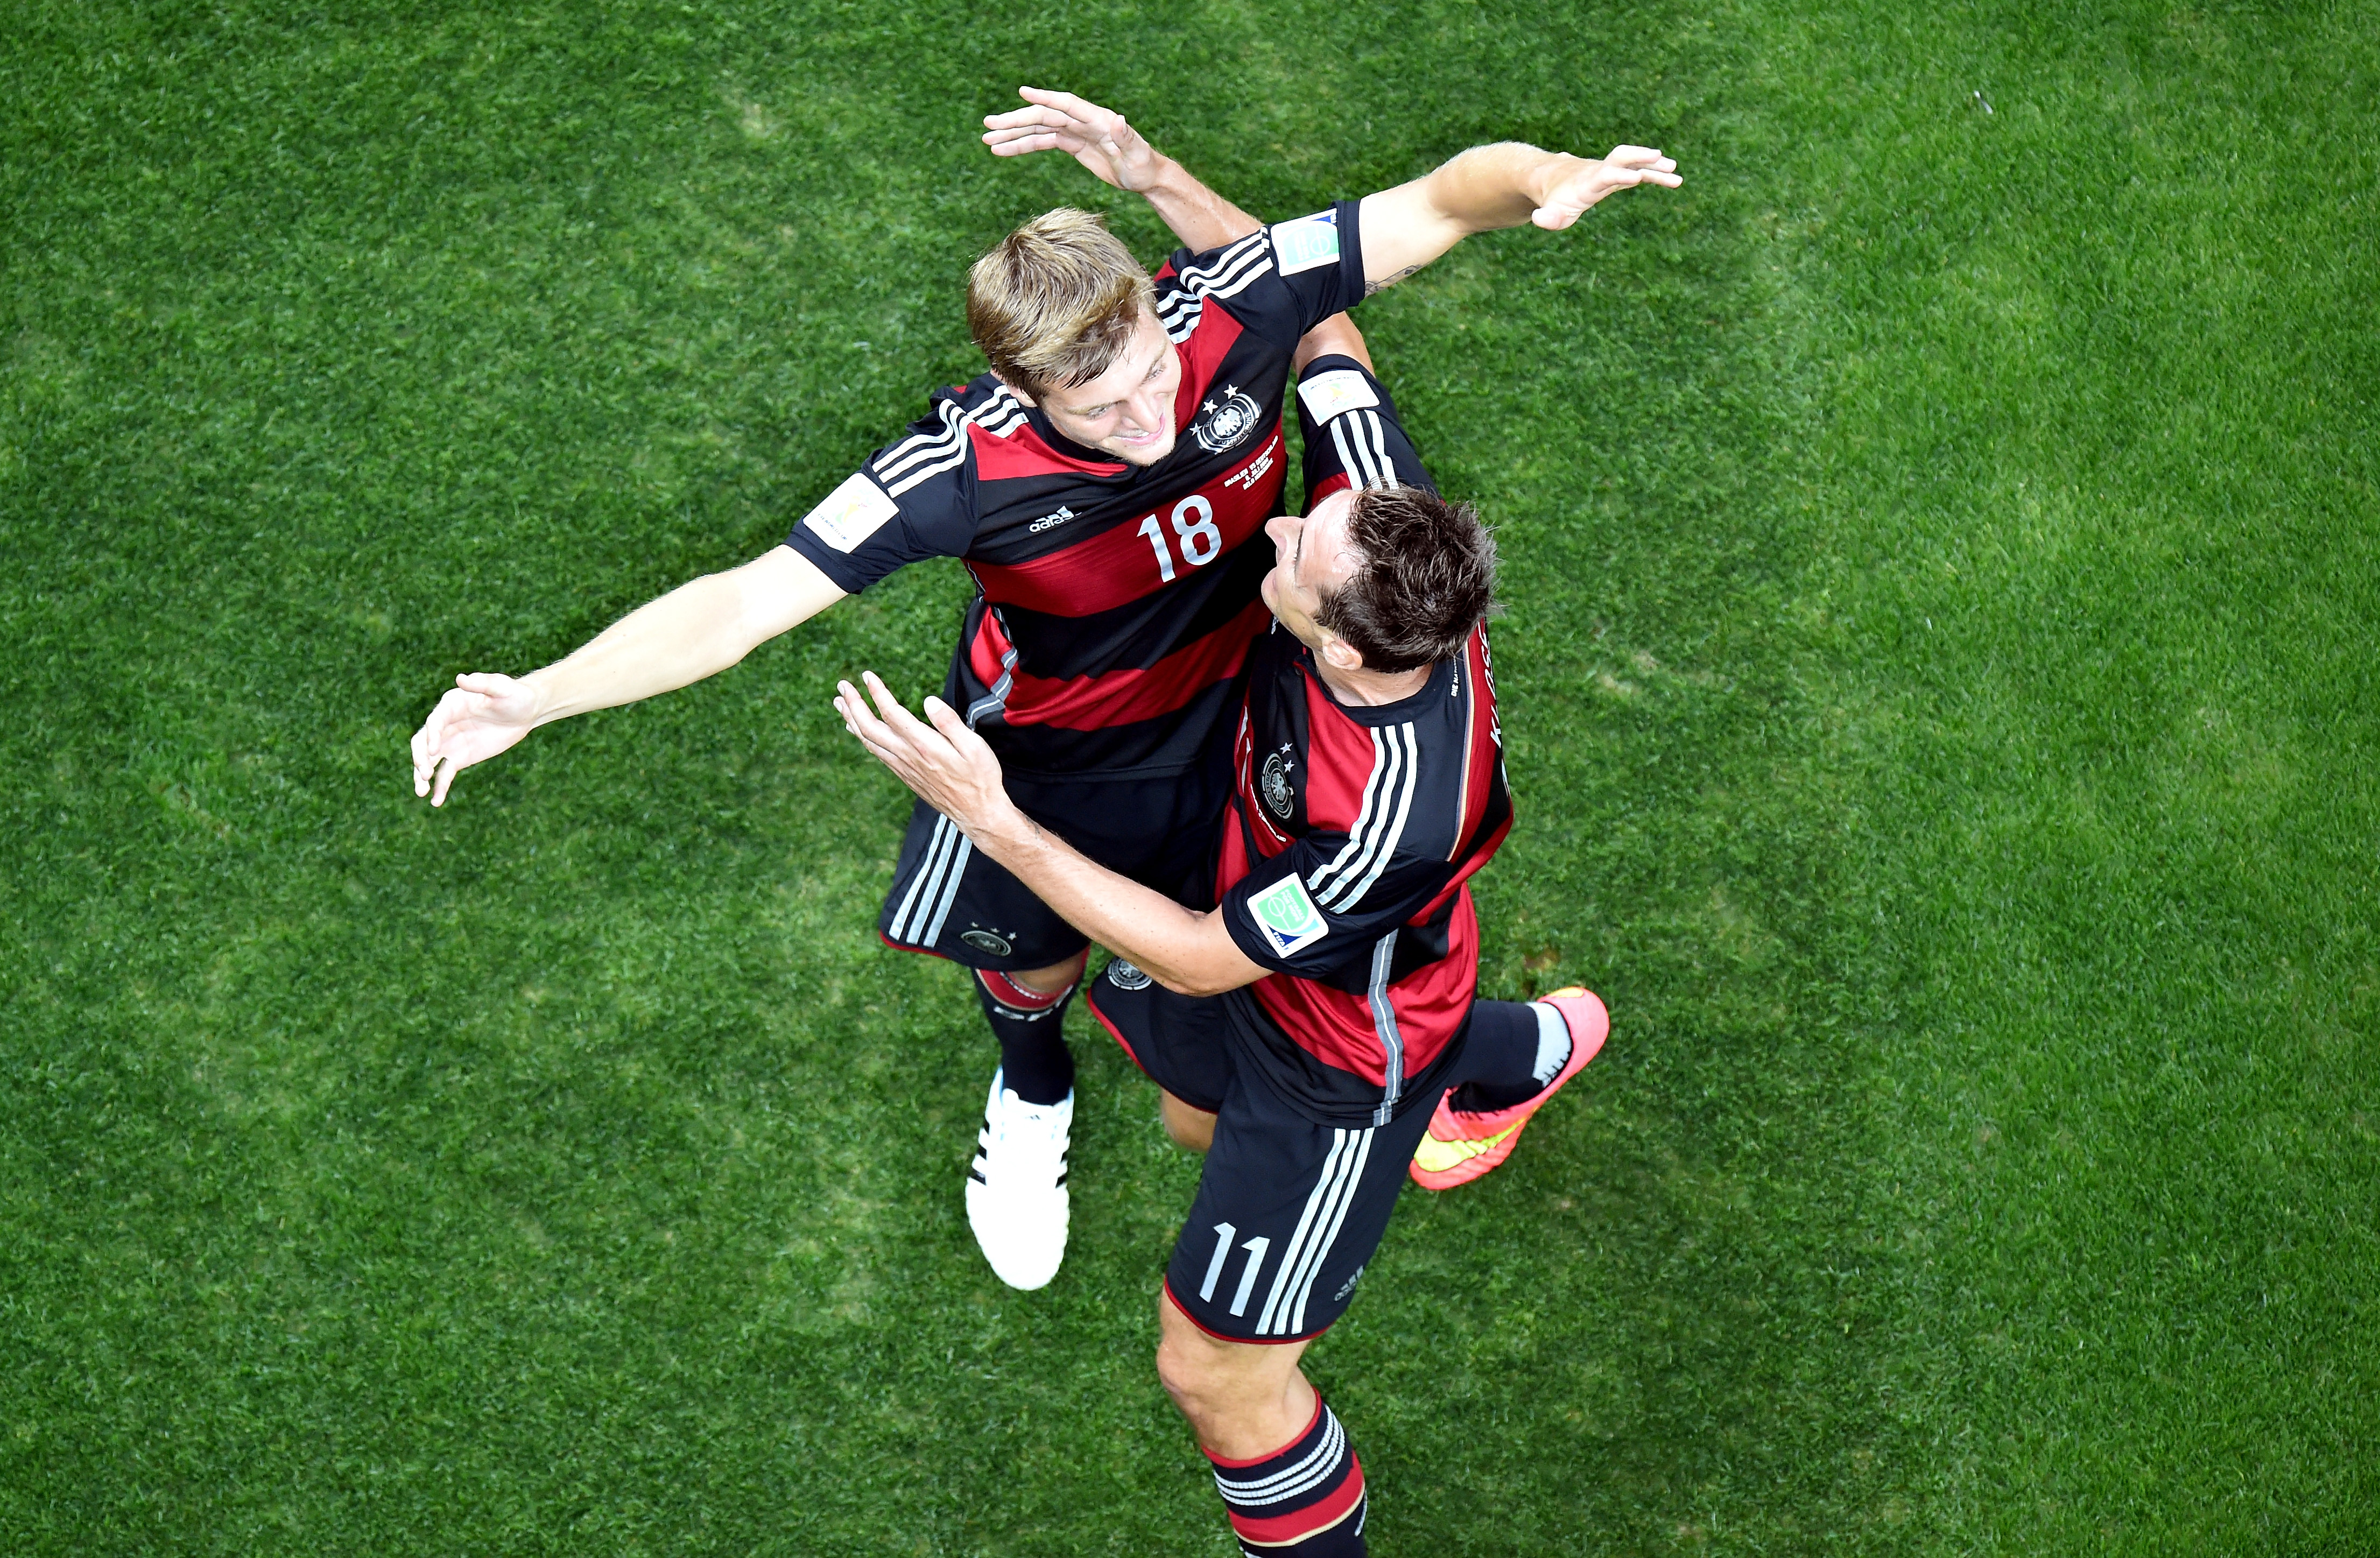 BELO HORIZONTE, BRAZIL - JULY 08: Toni Kroos of Germany (L) celebrates scoring his team's third goal with teammate Miroslav K